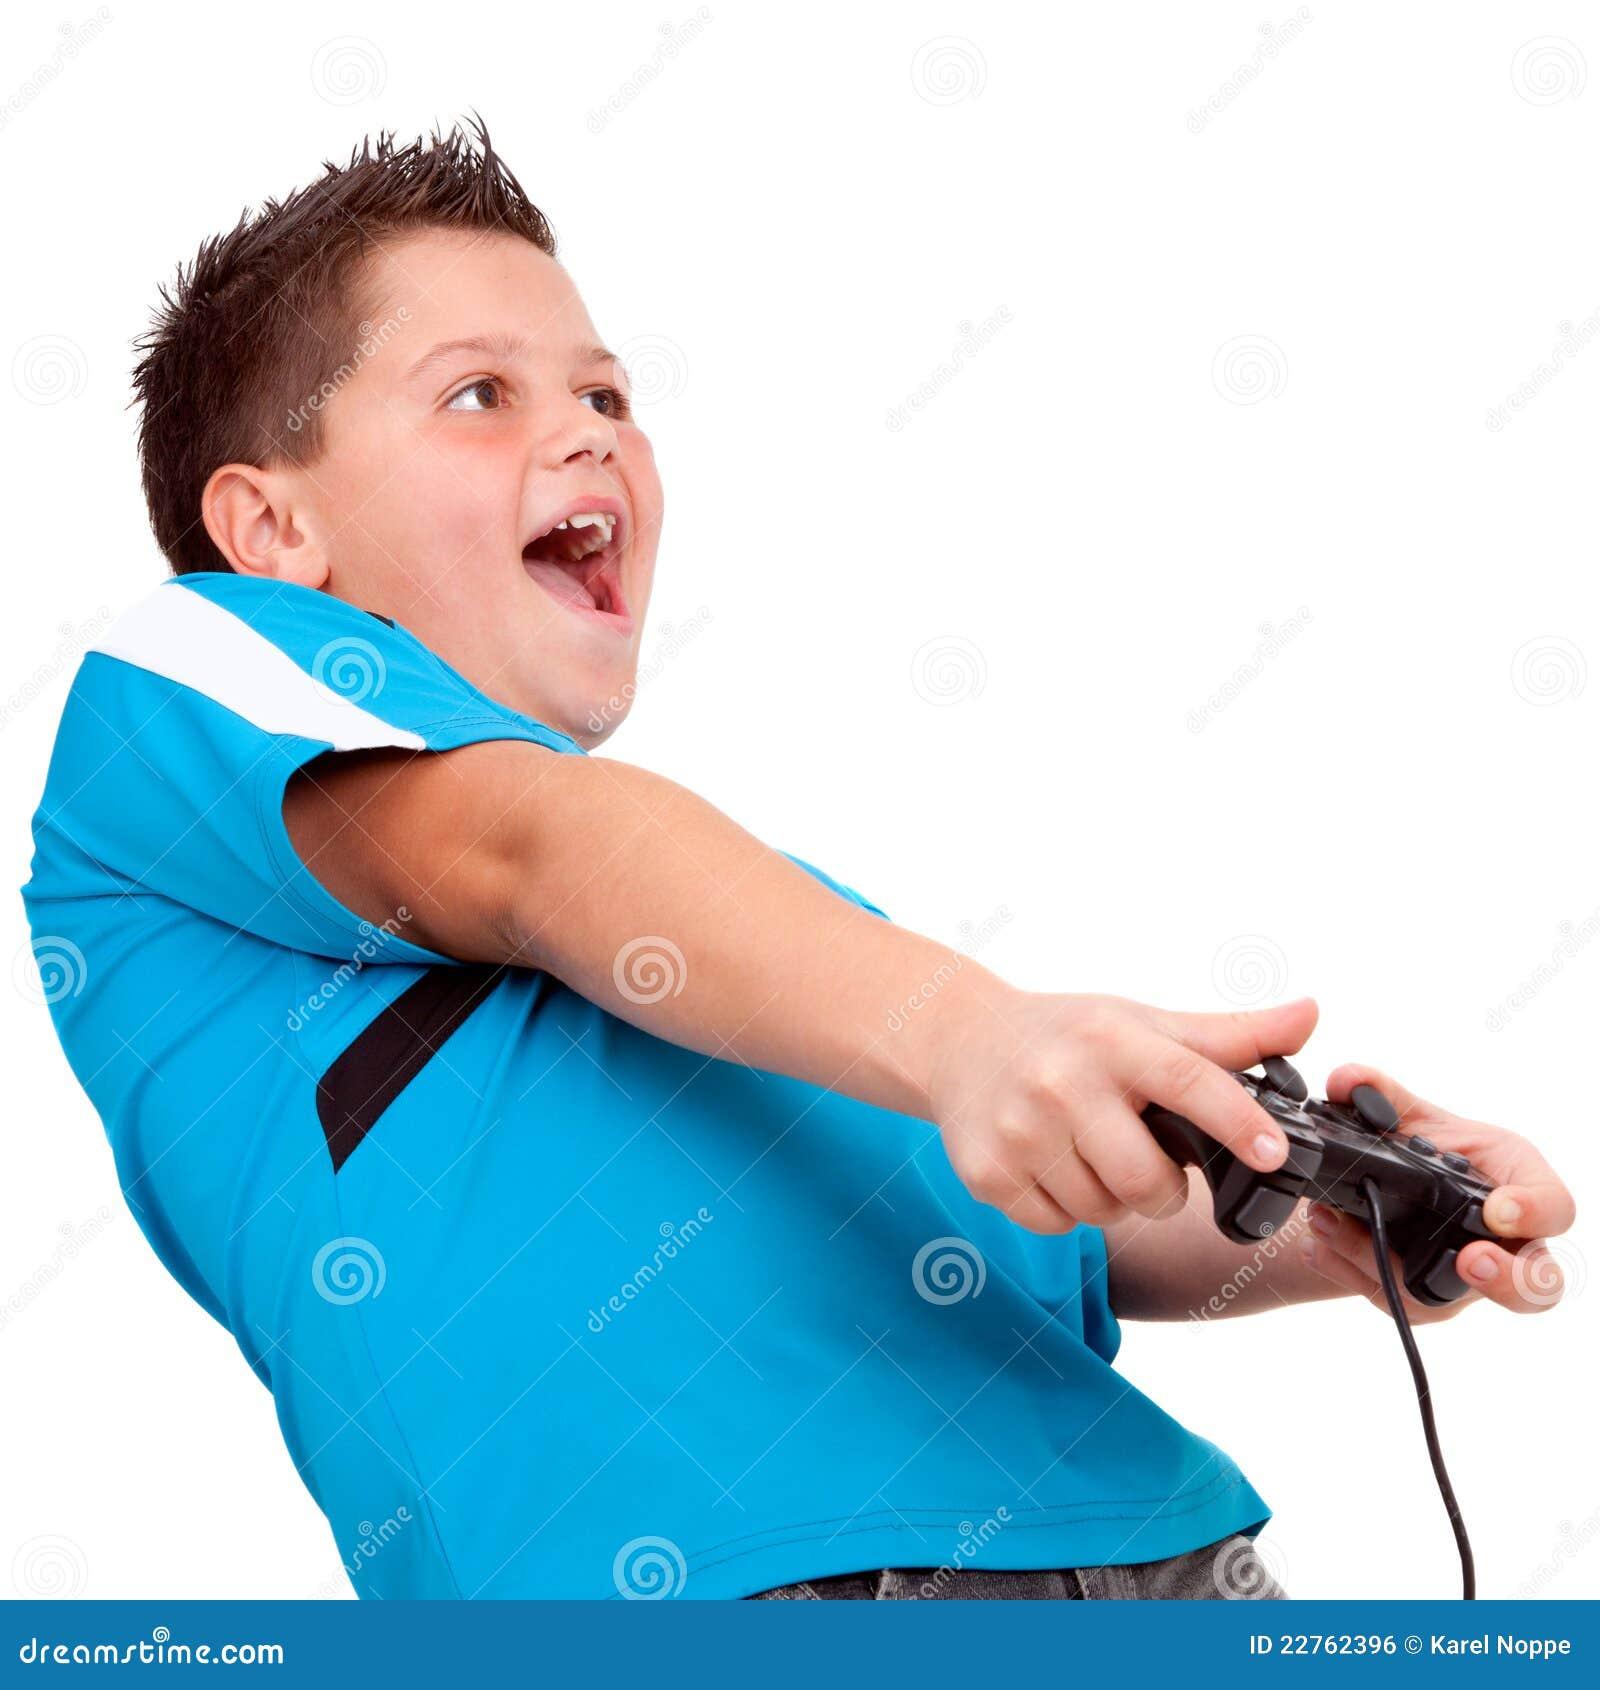 Play Son